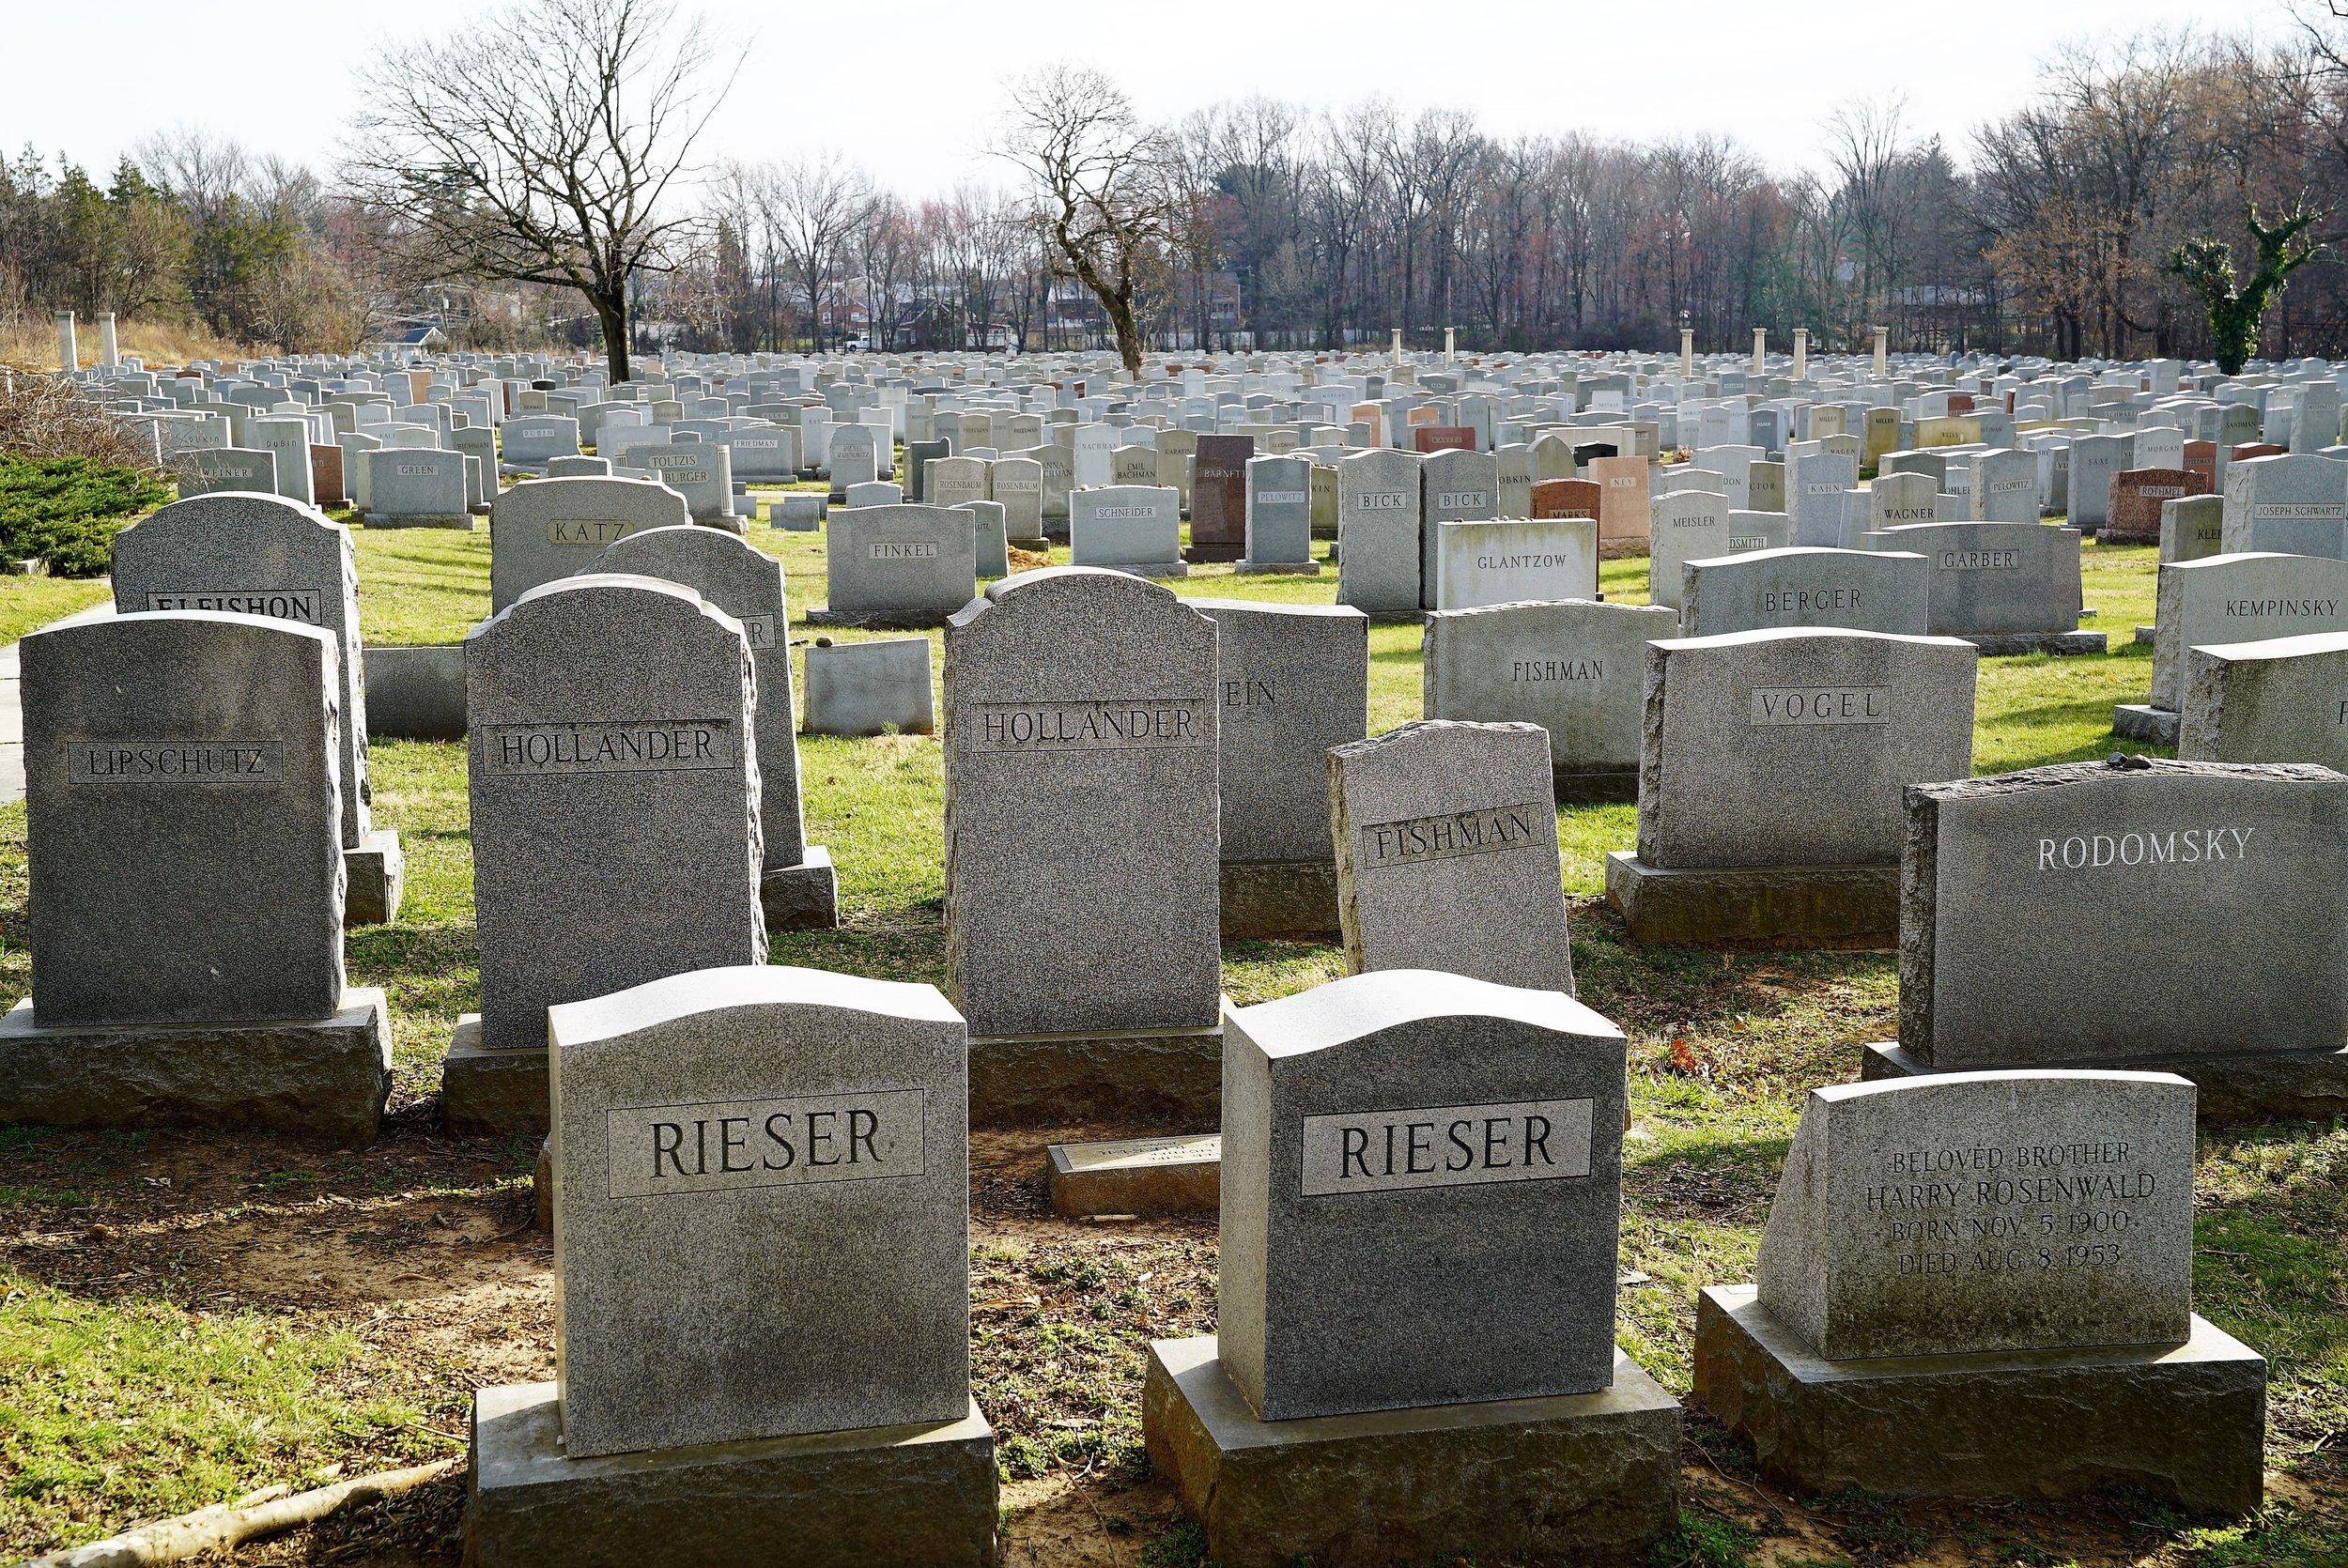 A sea of headstones. Mt. Sharon Cemetery, Springfield, PA.